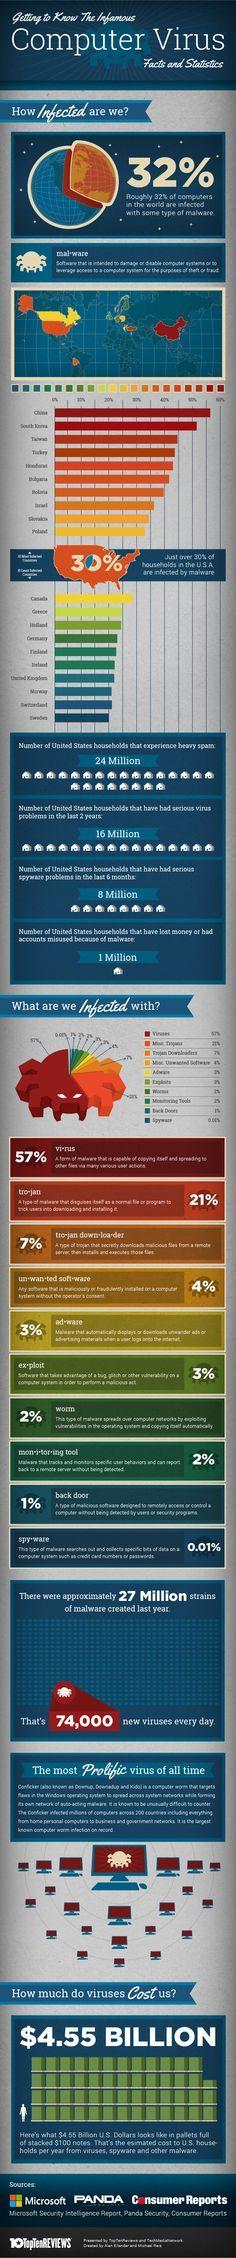 computer viruses infographic #computervirus